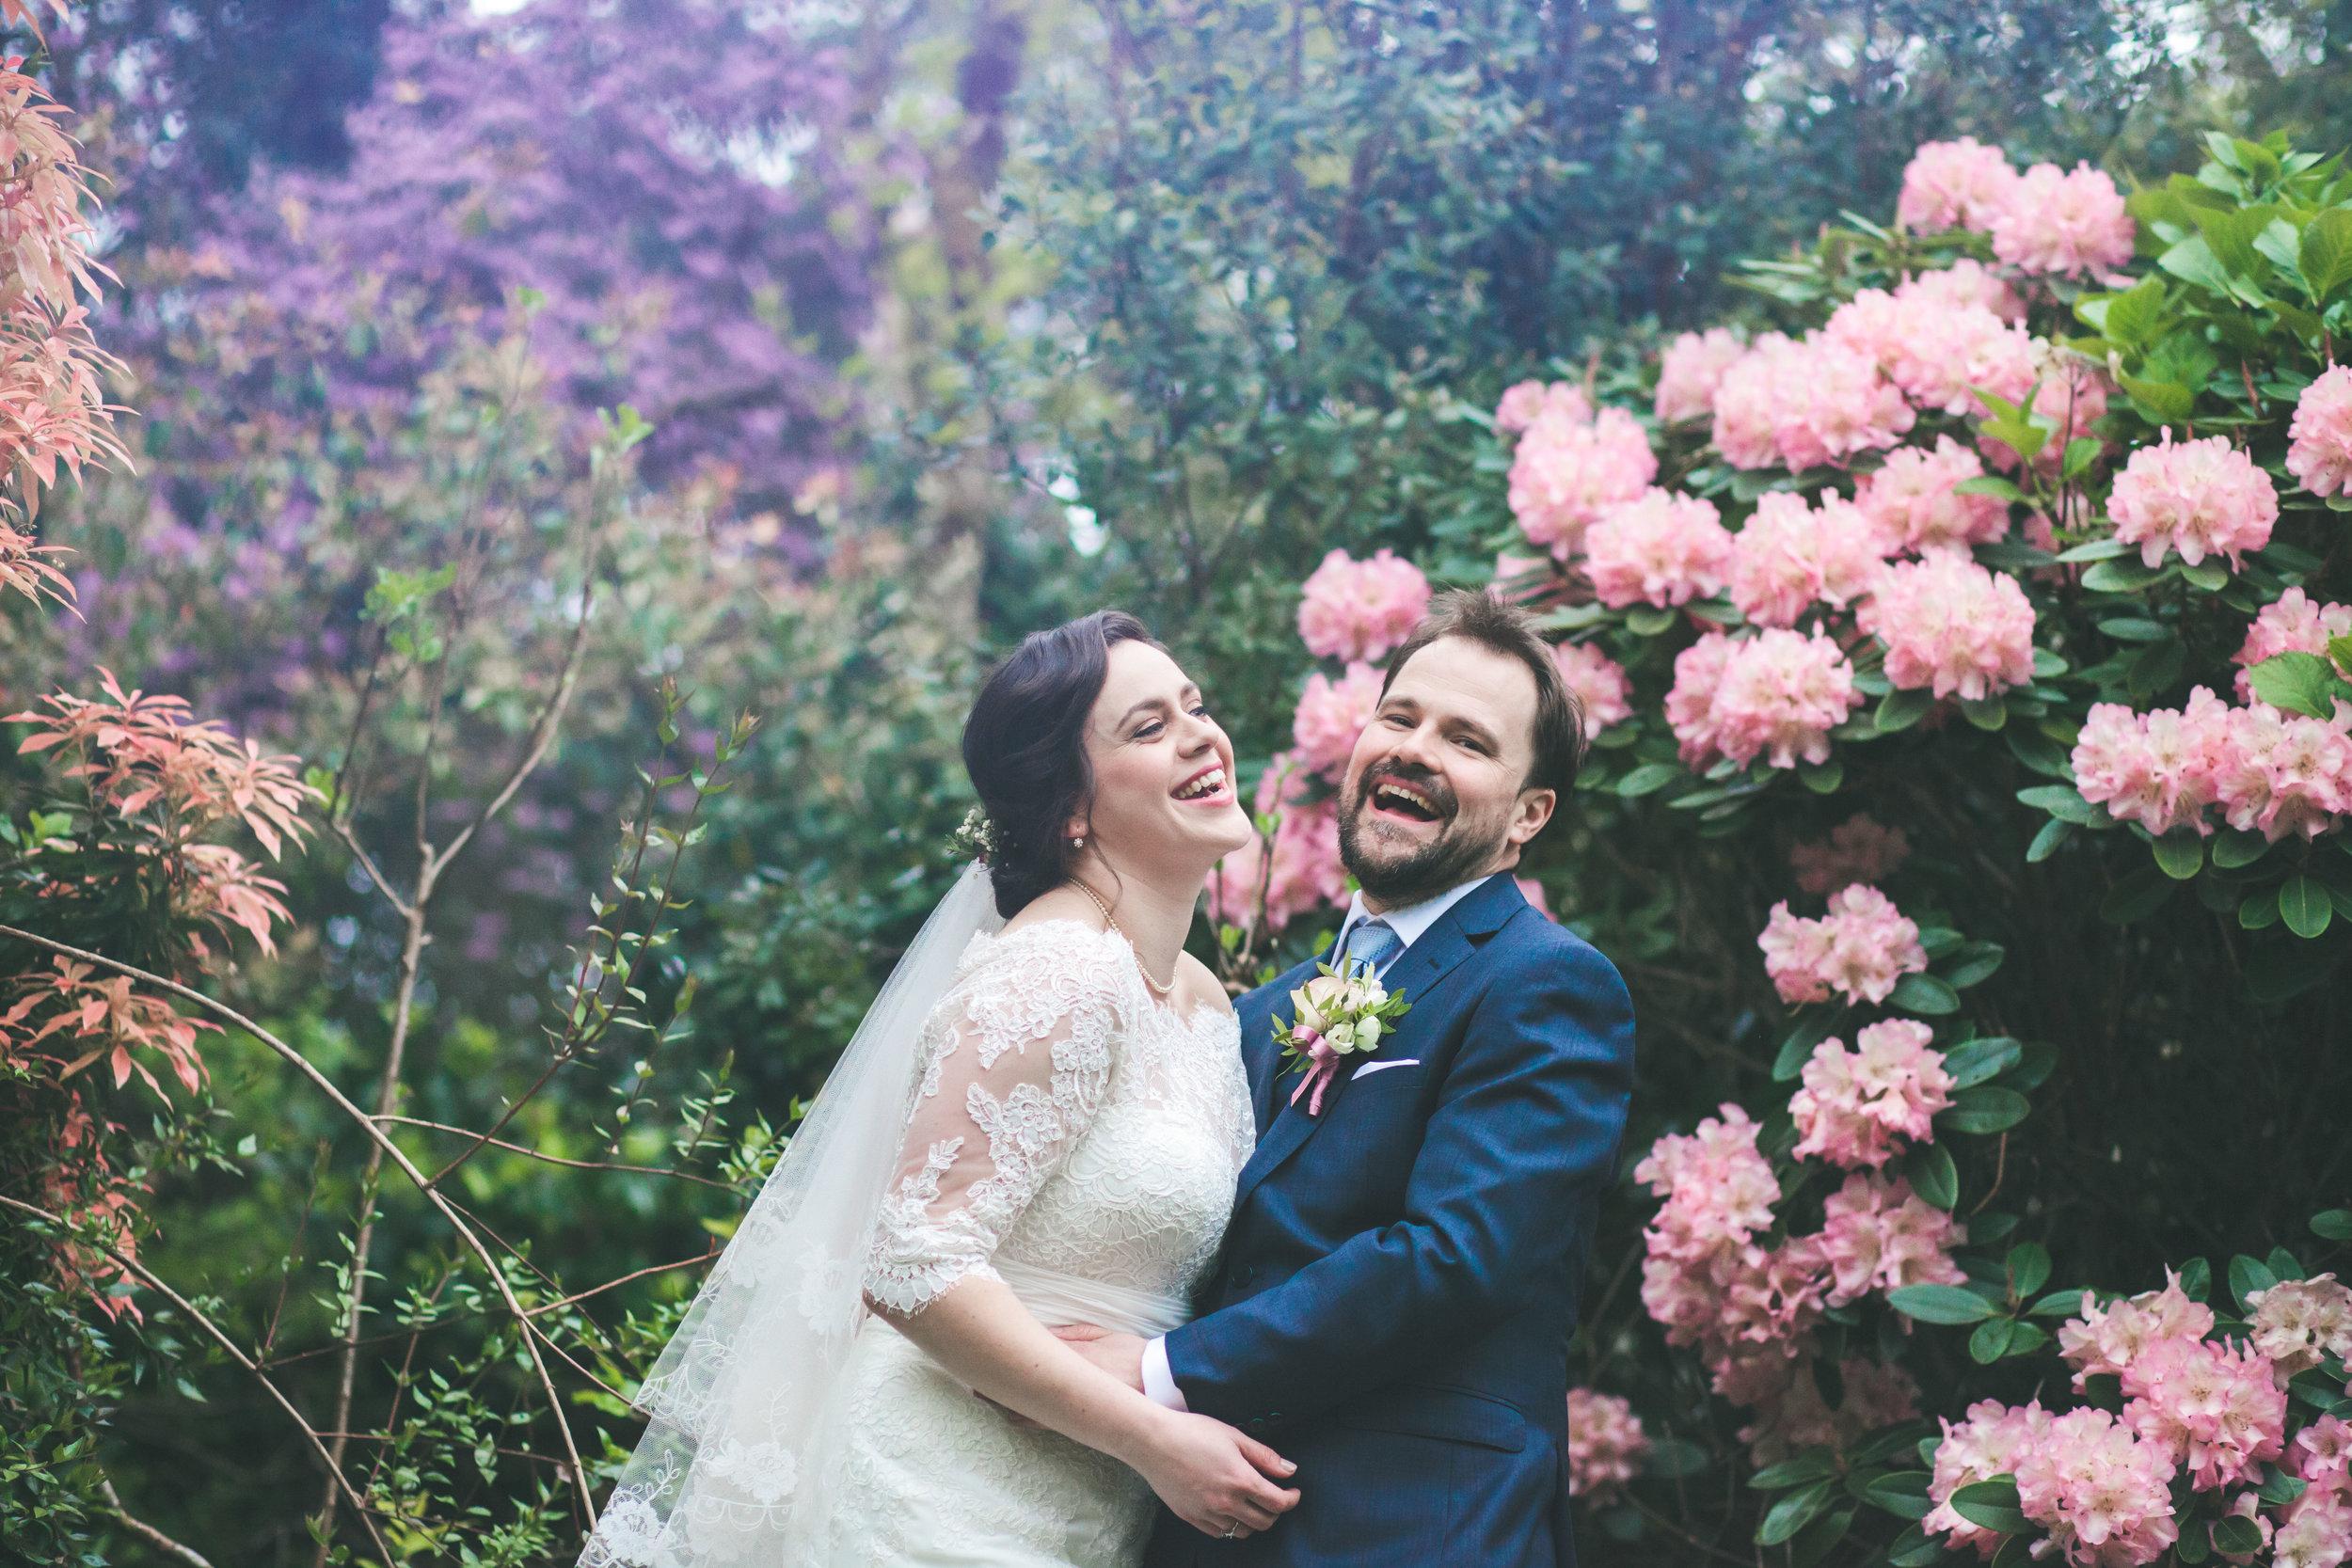 Cashel House Hotel Wedding by Olivia Moon Photography